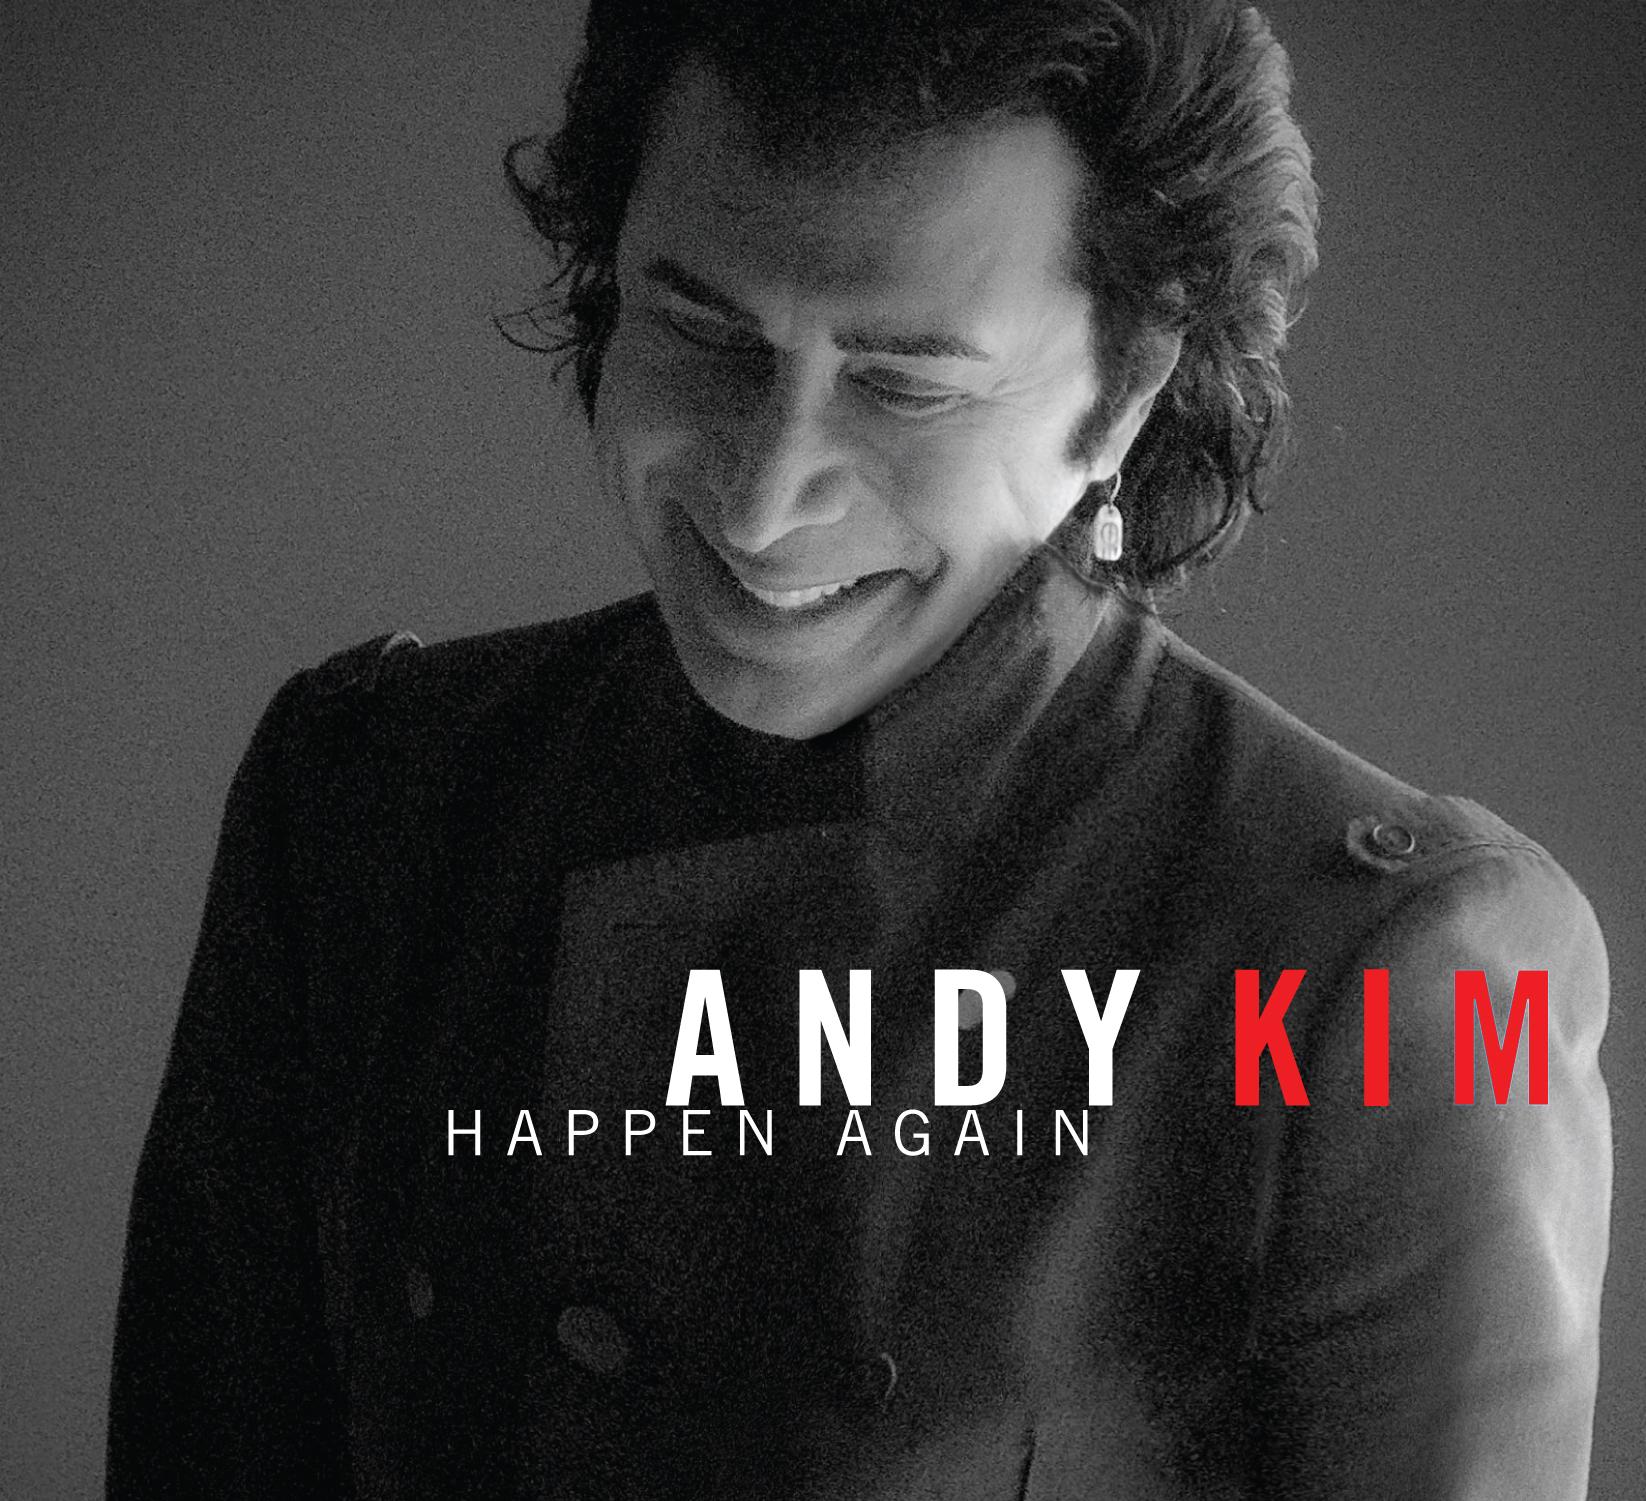 FREE DOWNLOAD]ANDY KIM- HAPPEN AGAIN (ALBUM)